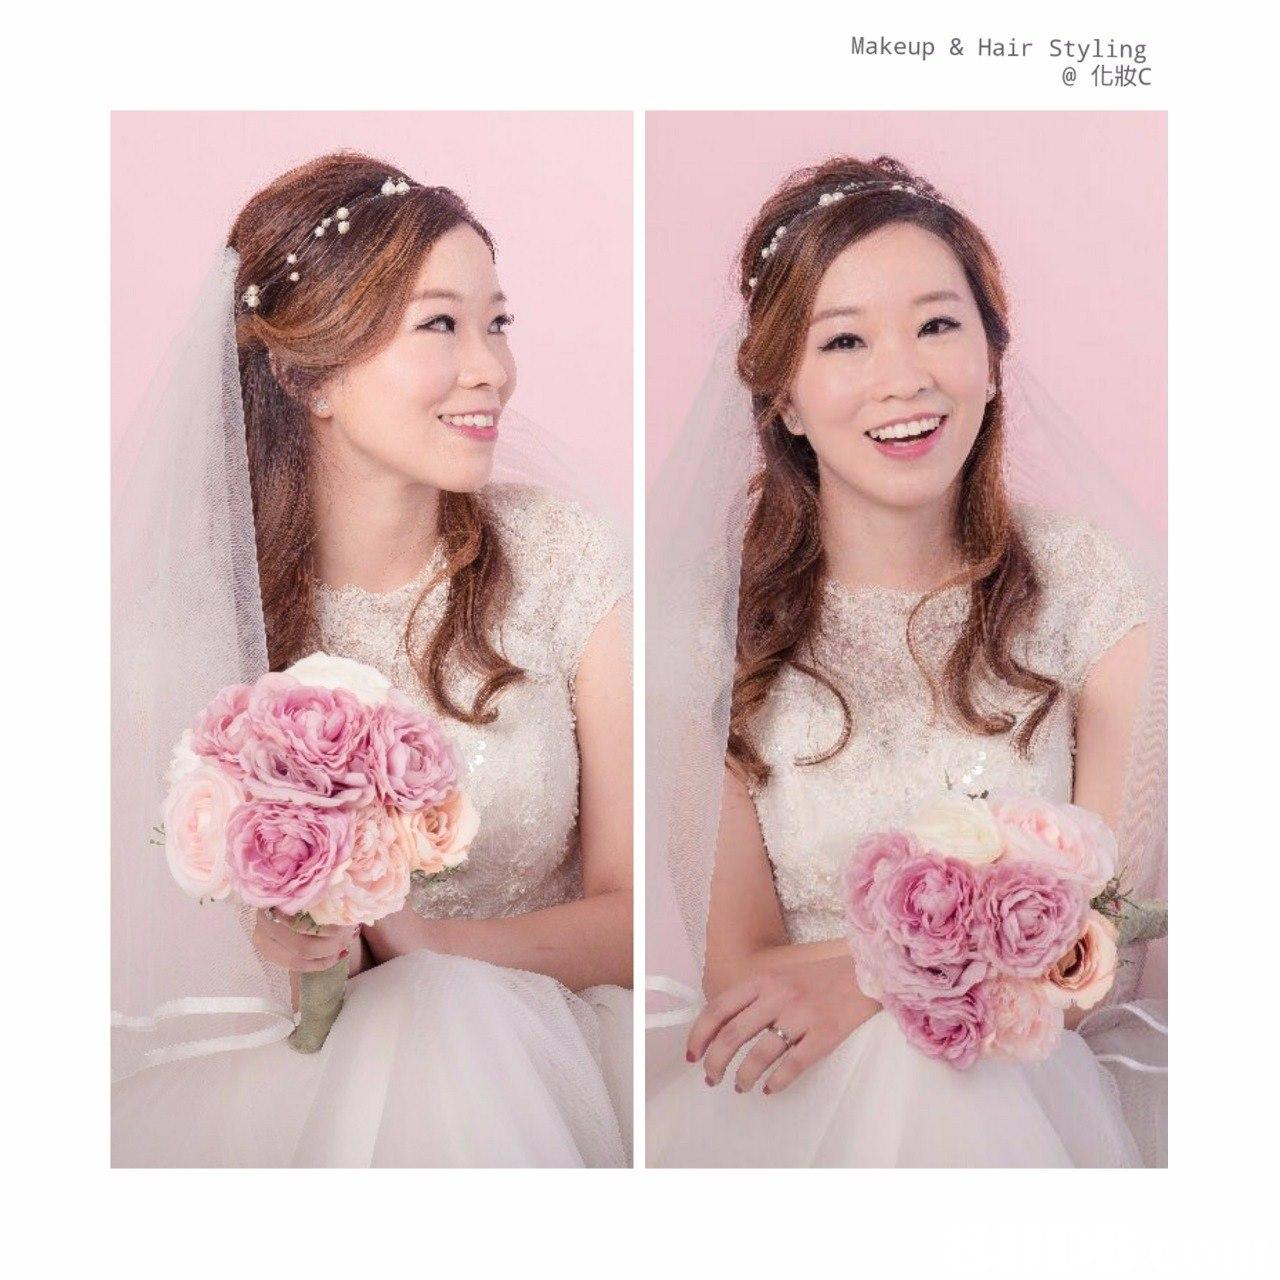 Makeup & Hair Styling @化妝C,pink,hair accessory,headpiece,bride,flower